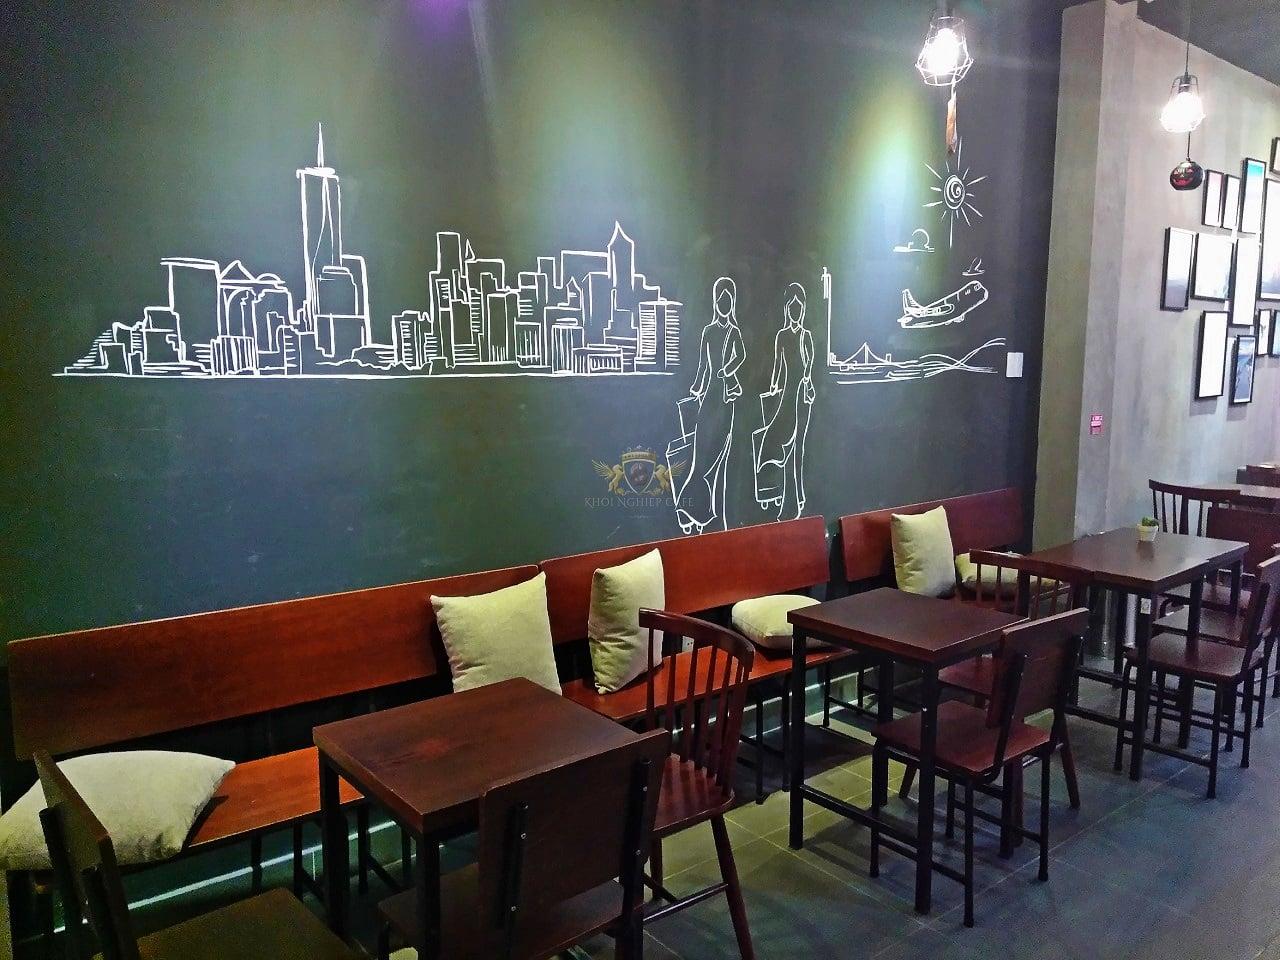 Dom Cafe Go Vap mua ban may pha cafe chuyen nghiep cua y Faema E98 RE A2 HC600 khoi nghiep cafe 18